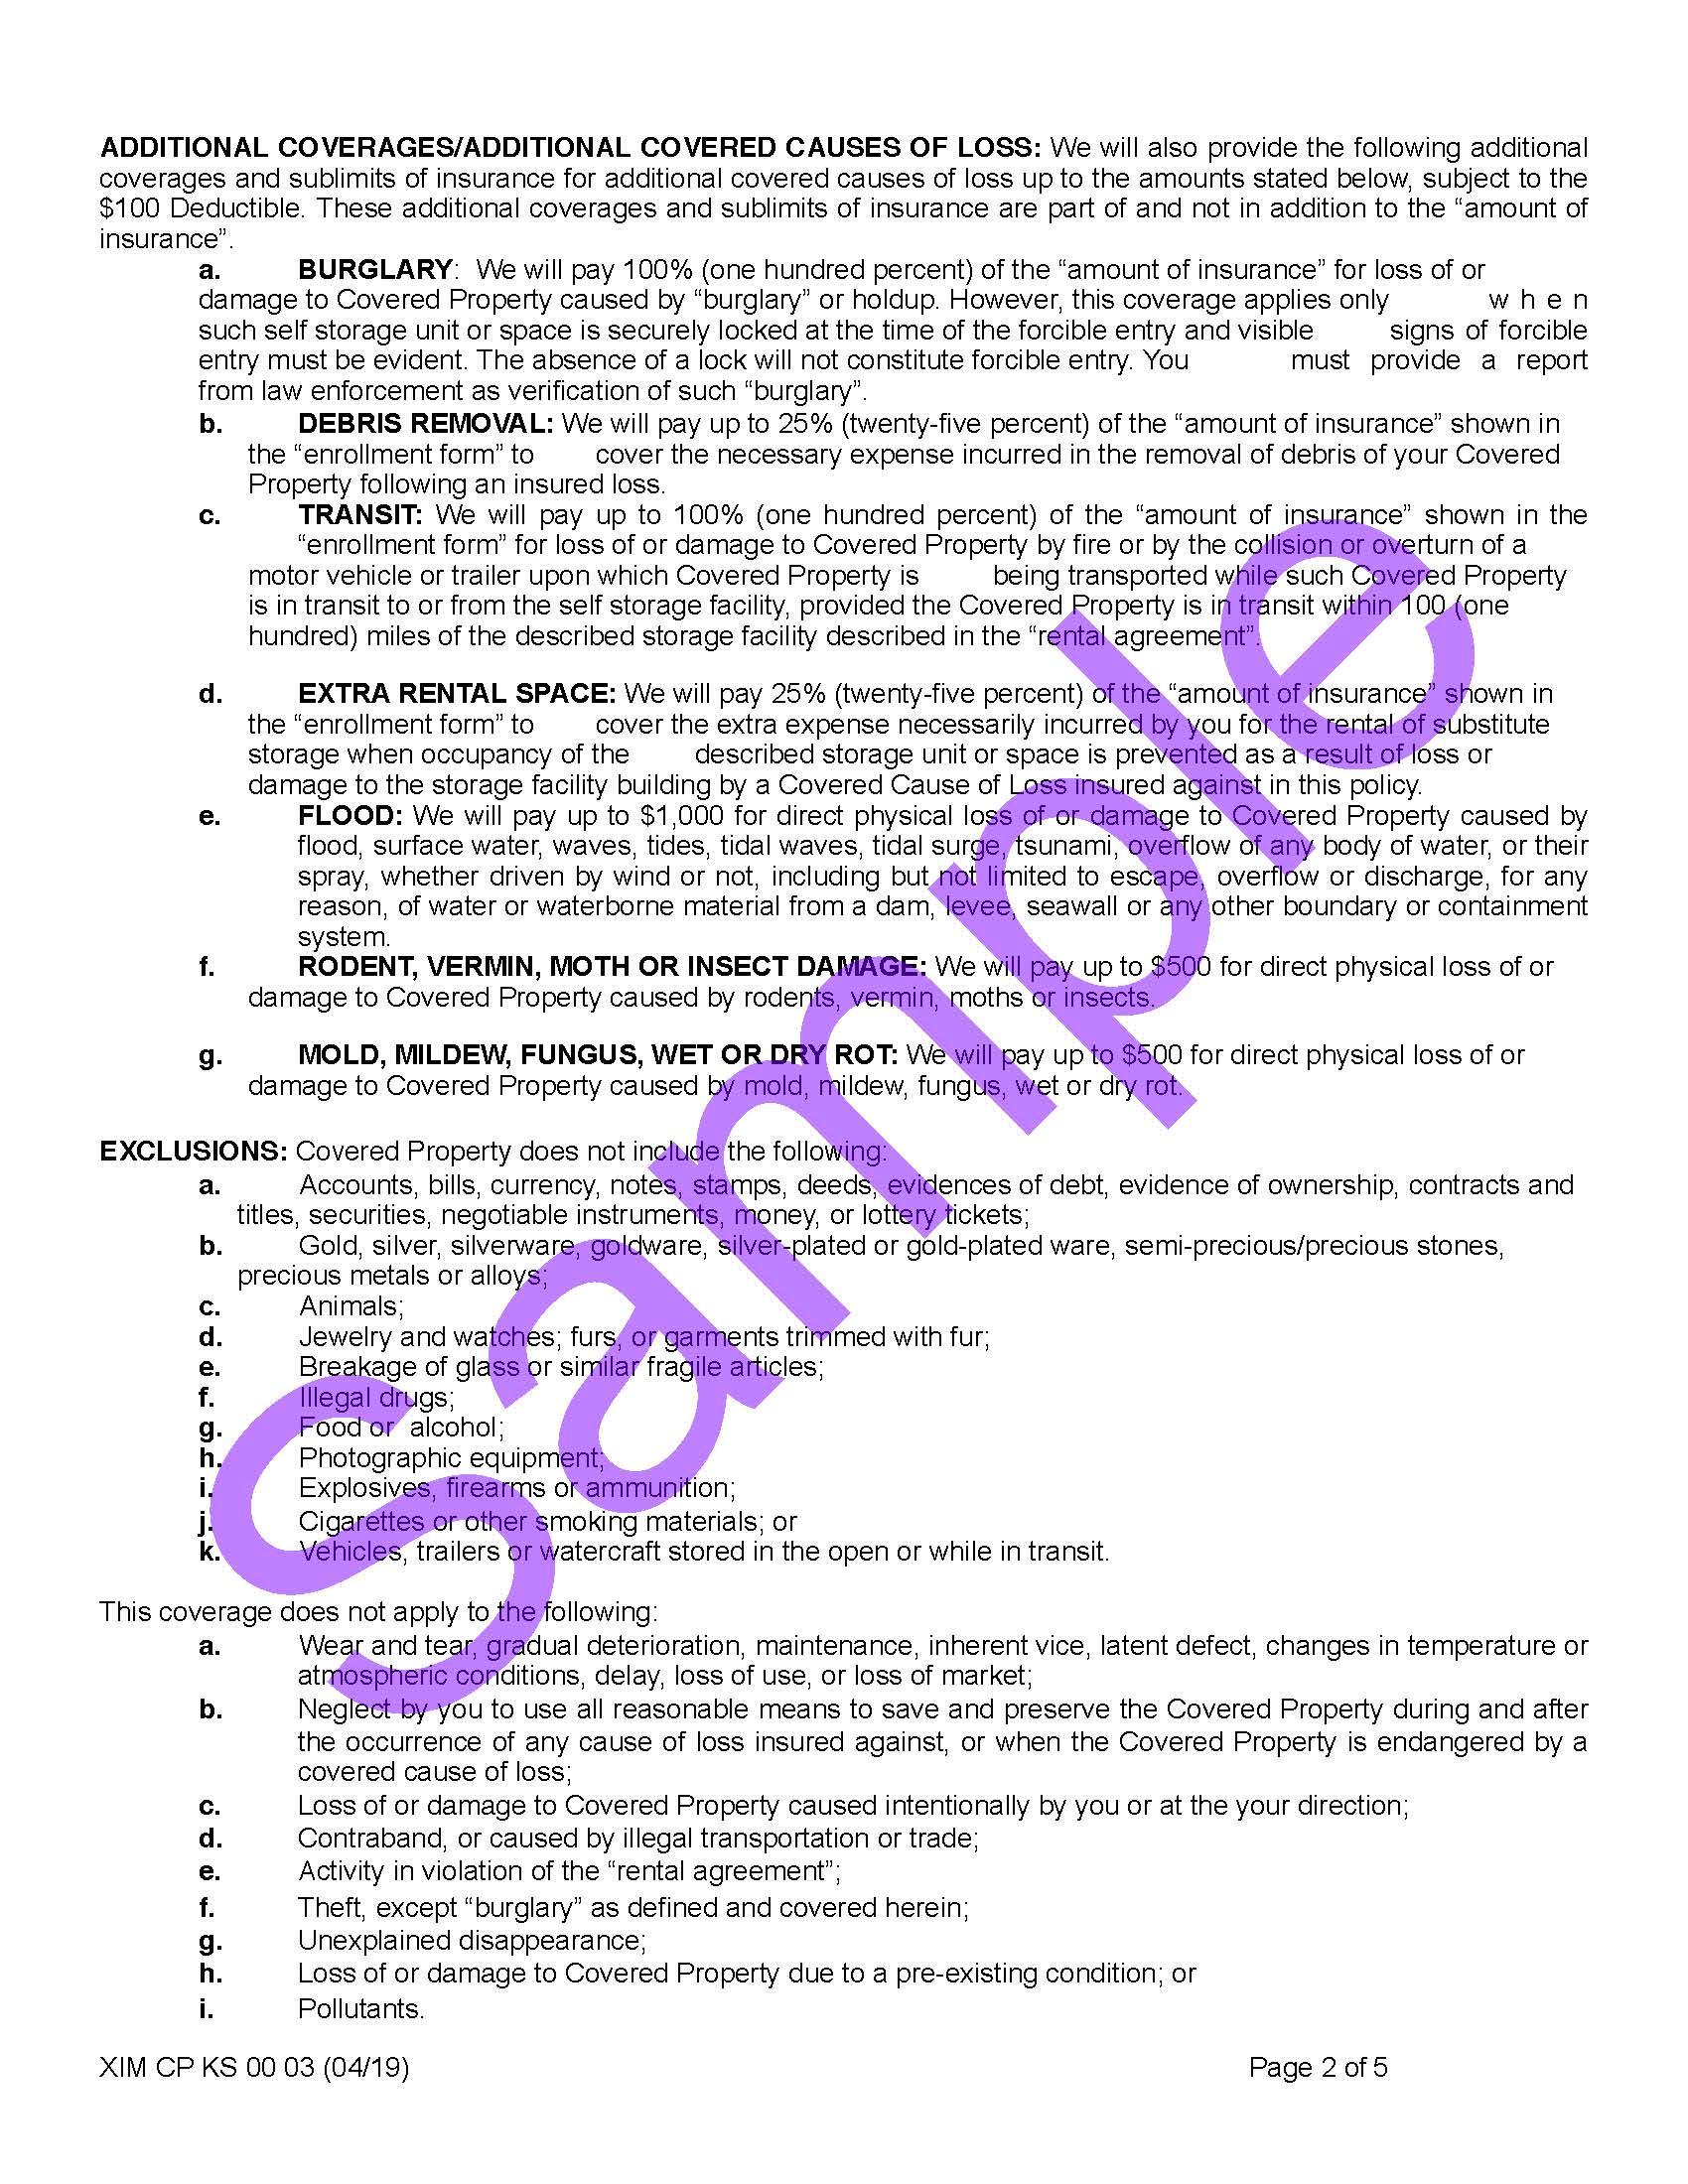 XIM CP KS 00 03 04 19 Kansas Certificate of InsuranceSample_Page_2.jpg